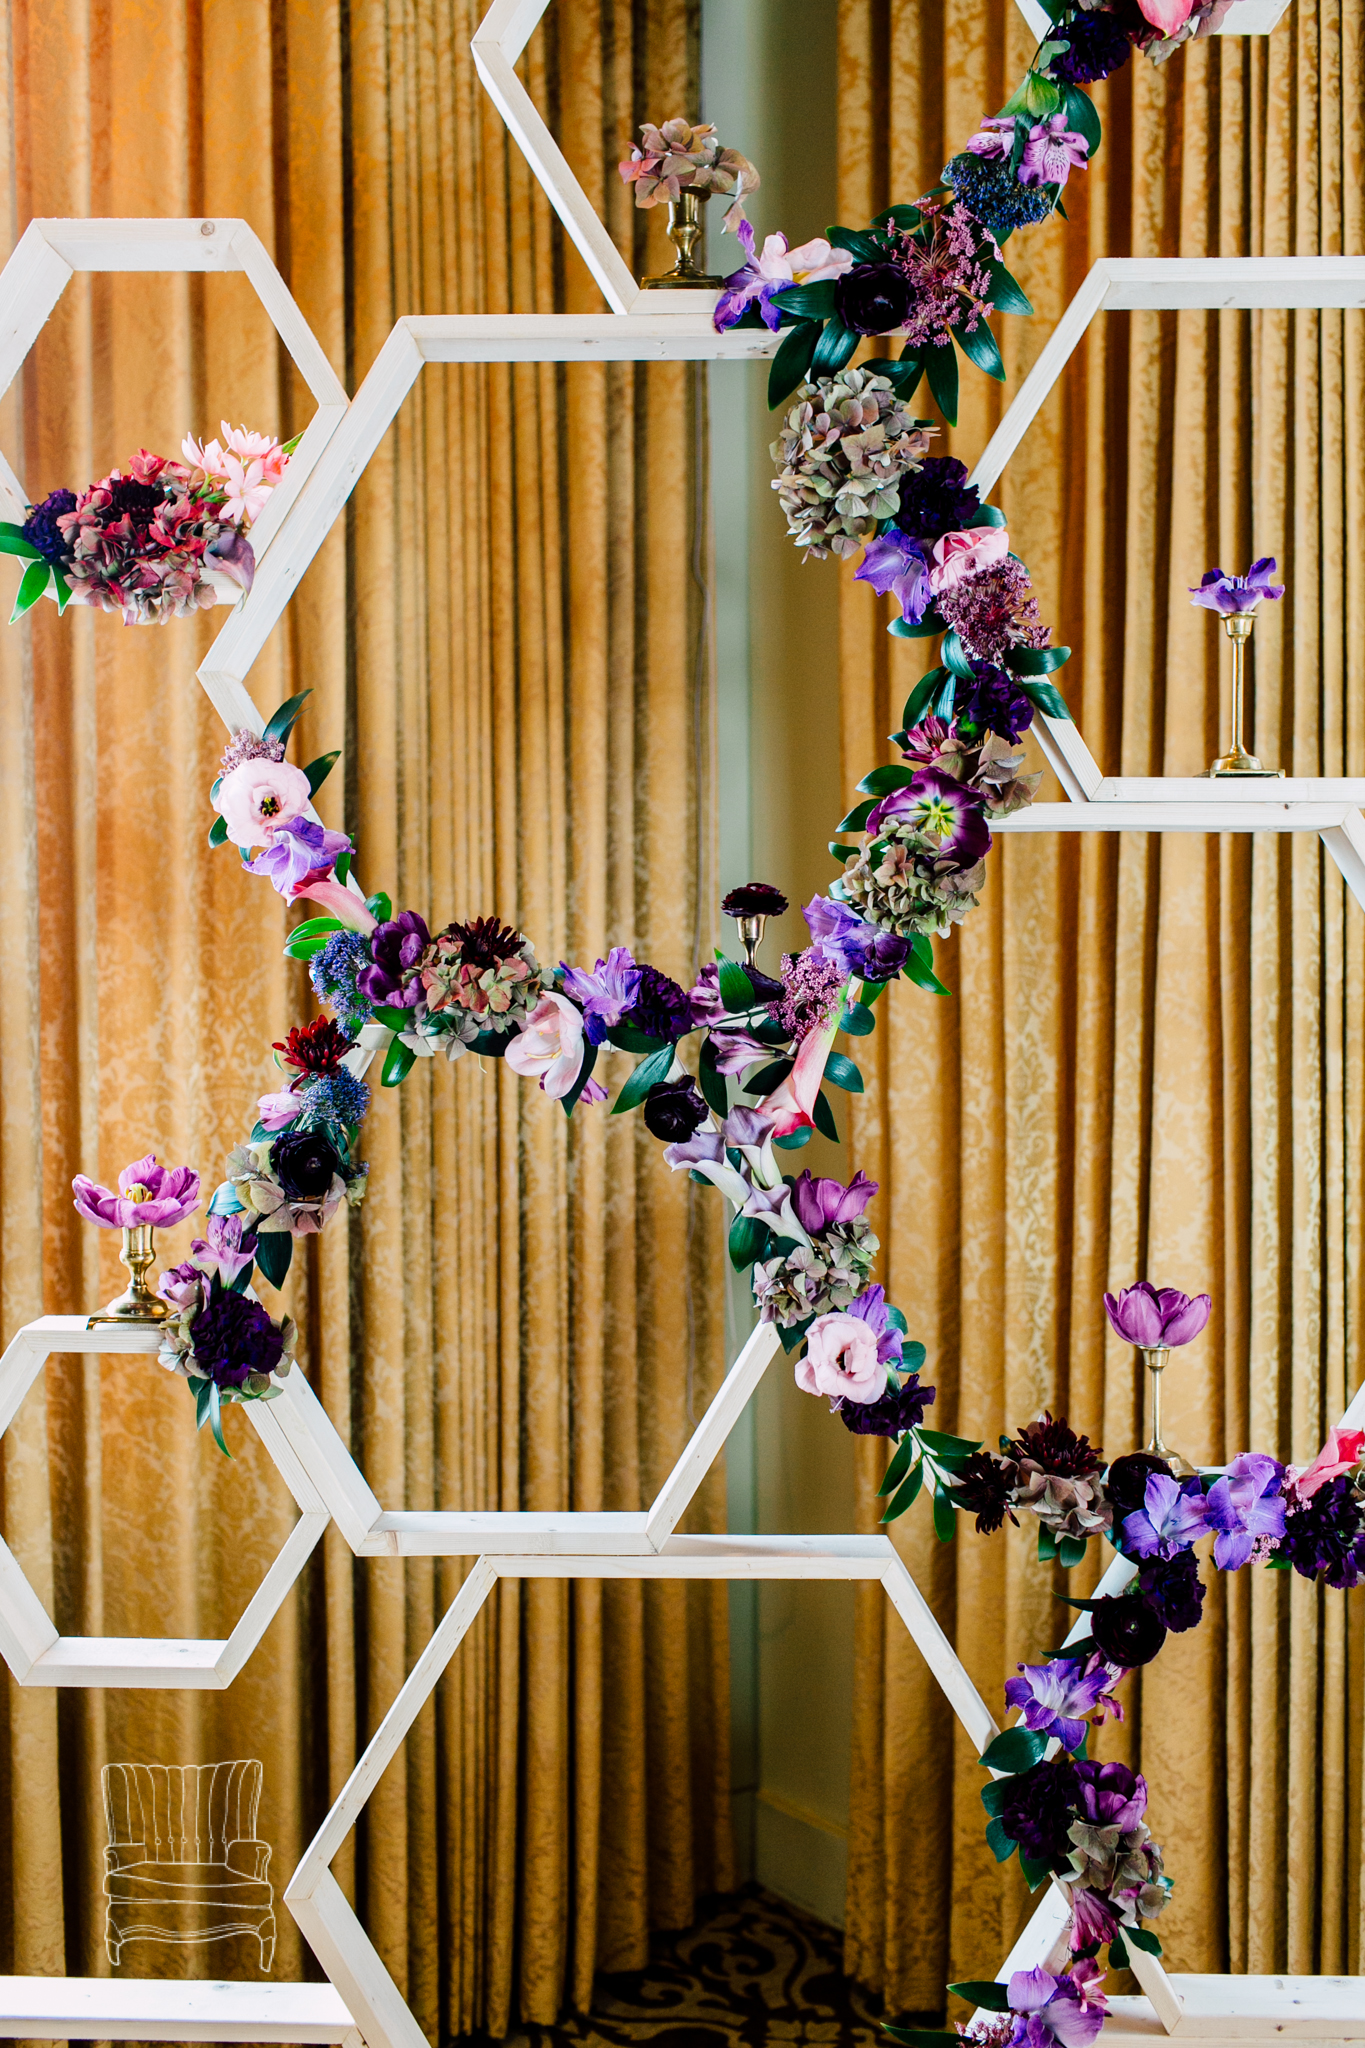 bellwether-bellingham-wedding-styled-katheryn-moran-photography-8.jpg